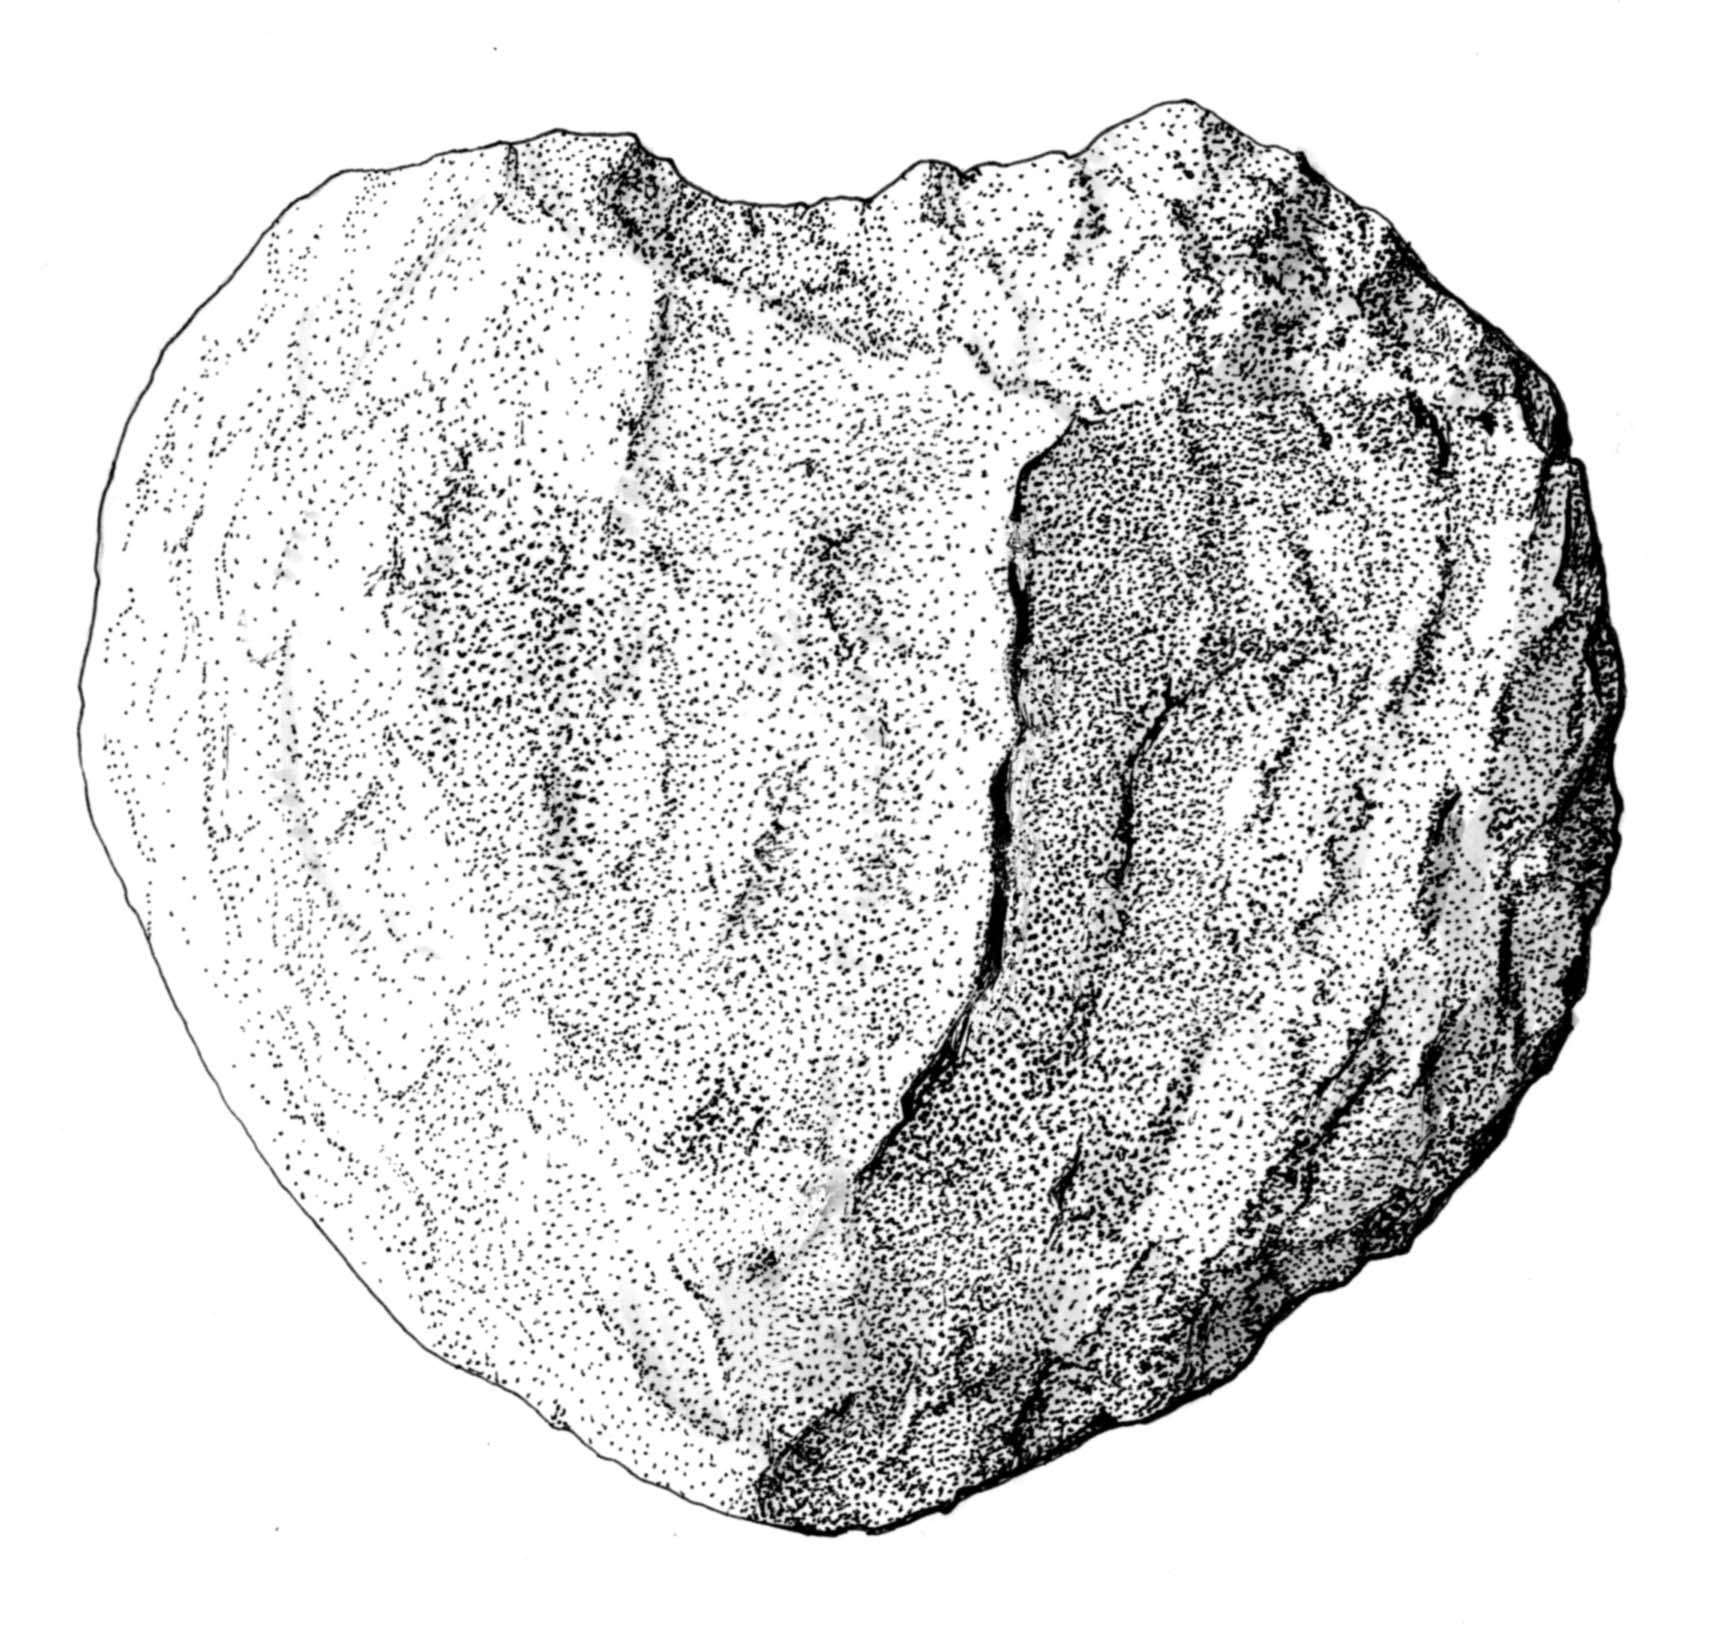 Drawn stone  Stone Drawing Rock